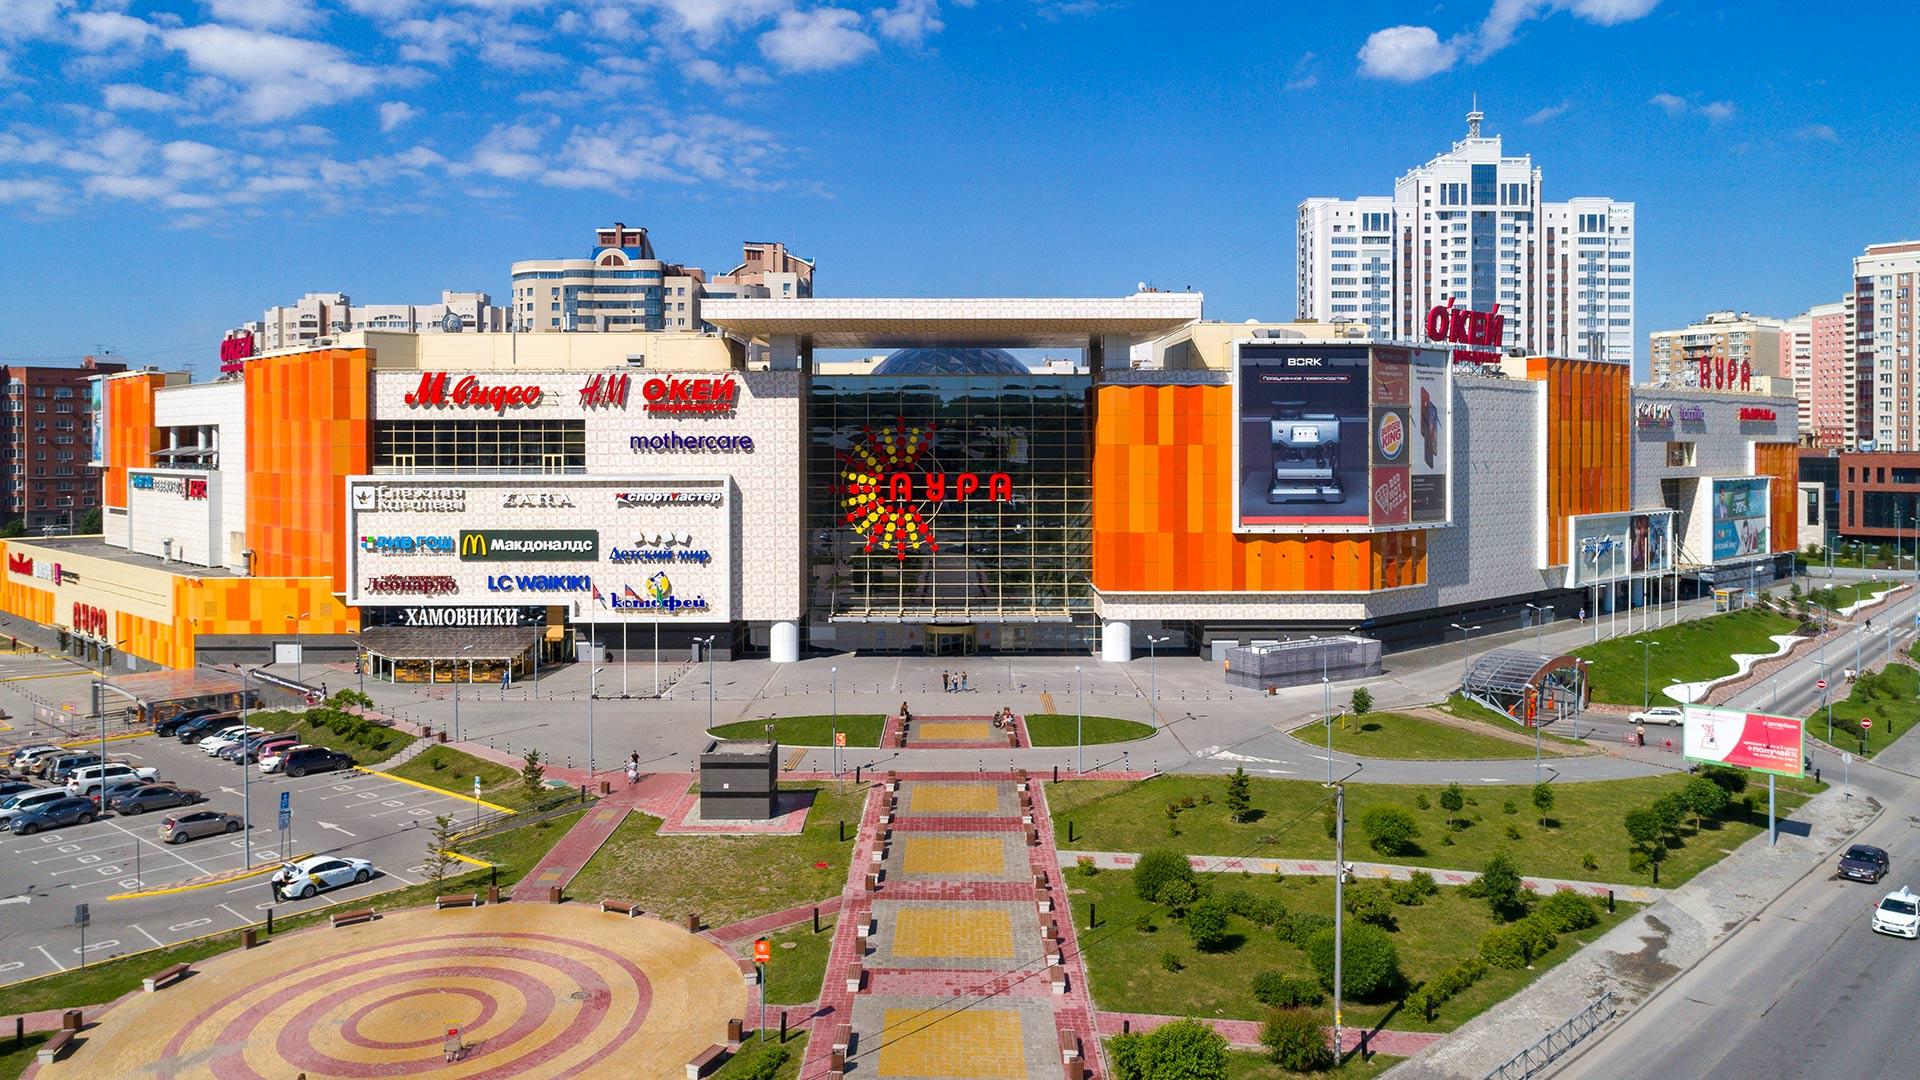 Картинки торгового центра аура в новосибирске